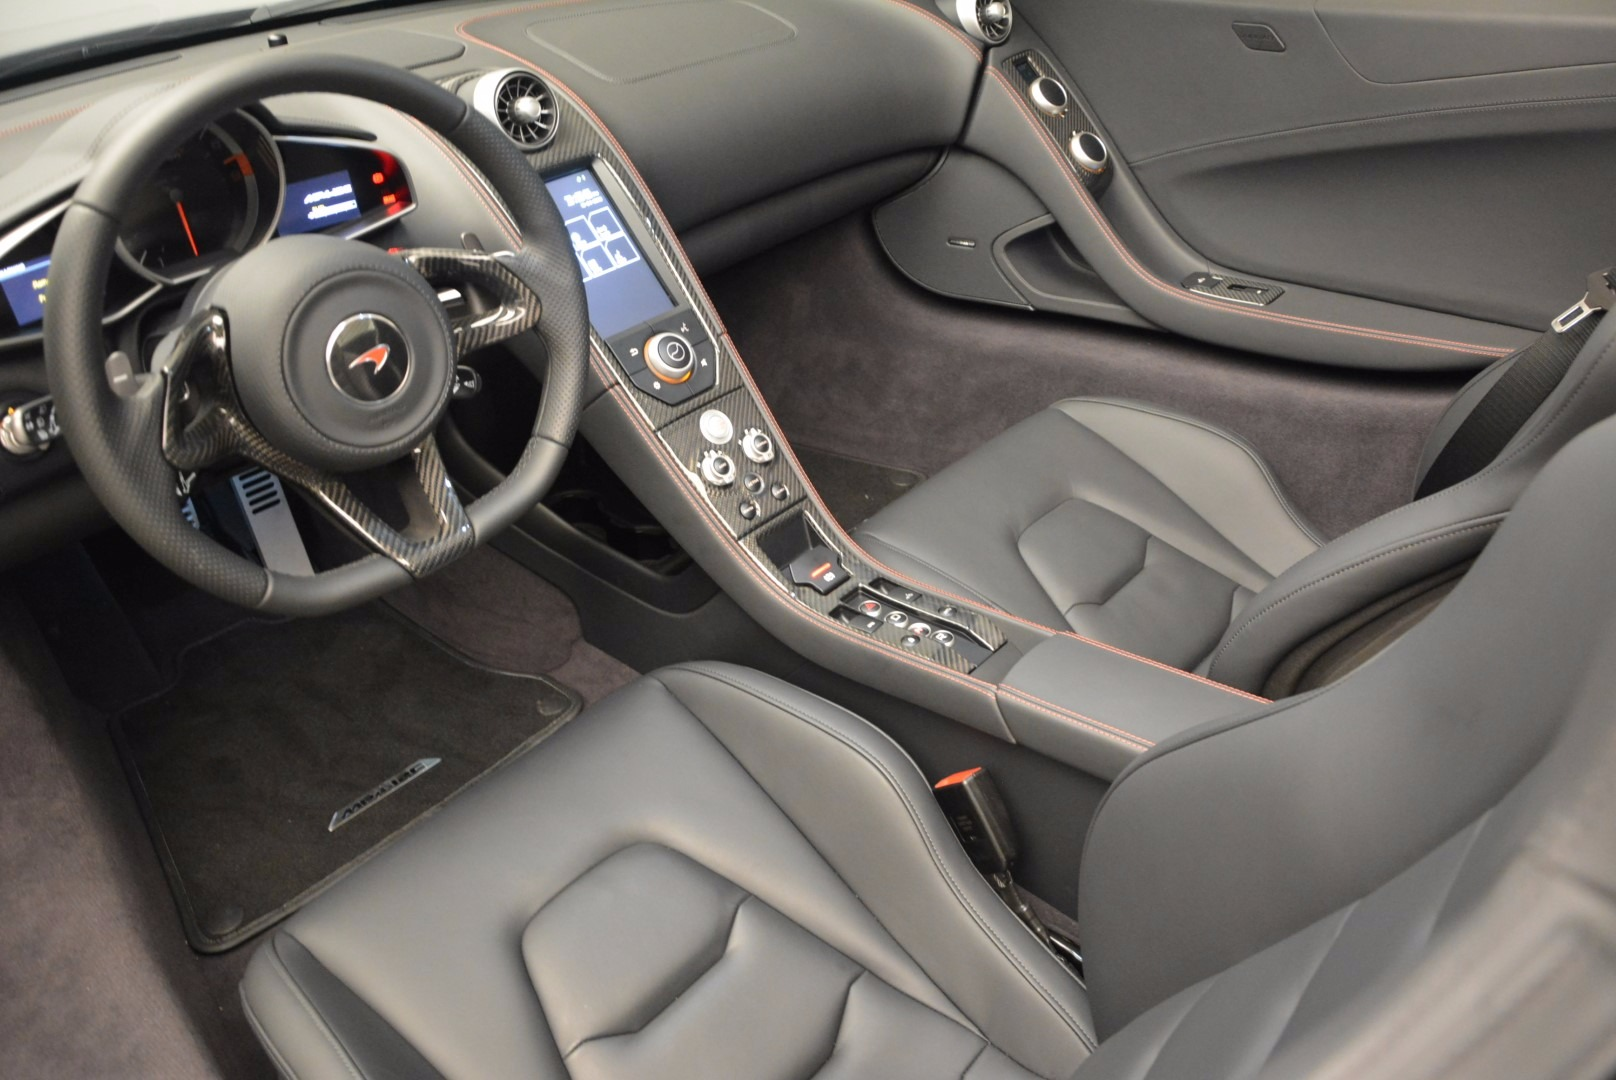 Used 2014 McLaren MP4-12C Spider  For Sale In Greenwich, CT. Alfa Romeo of Greenwich, 3089 627_p22